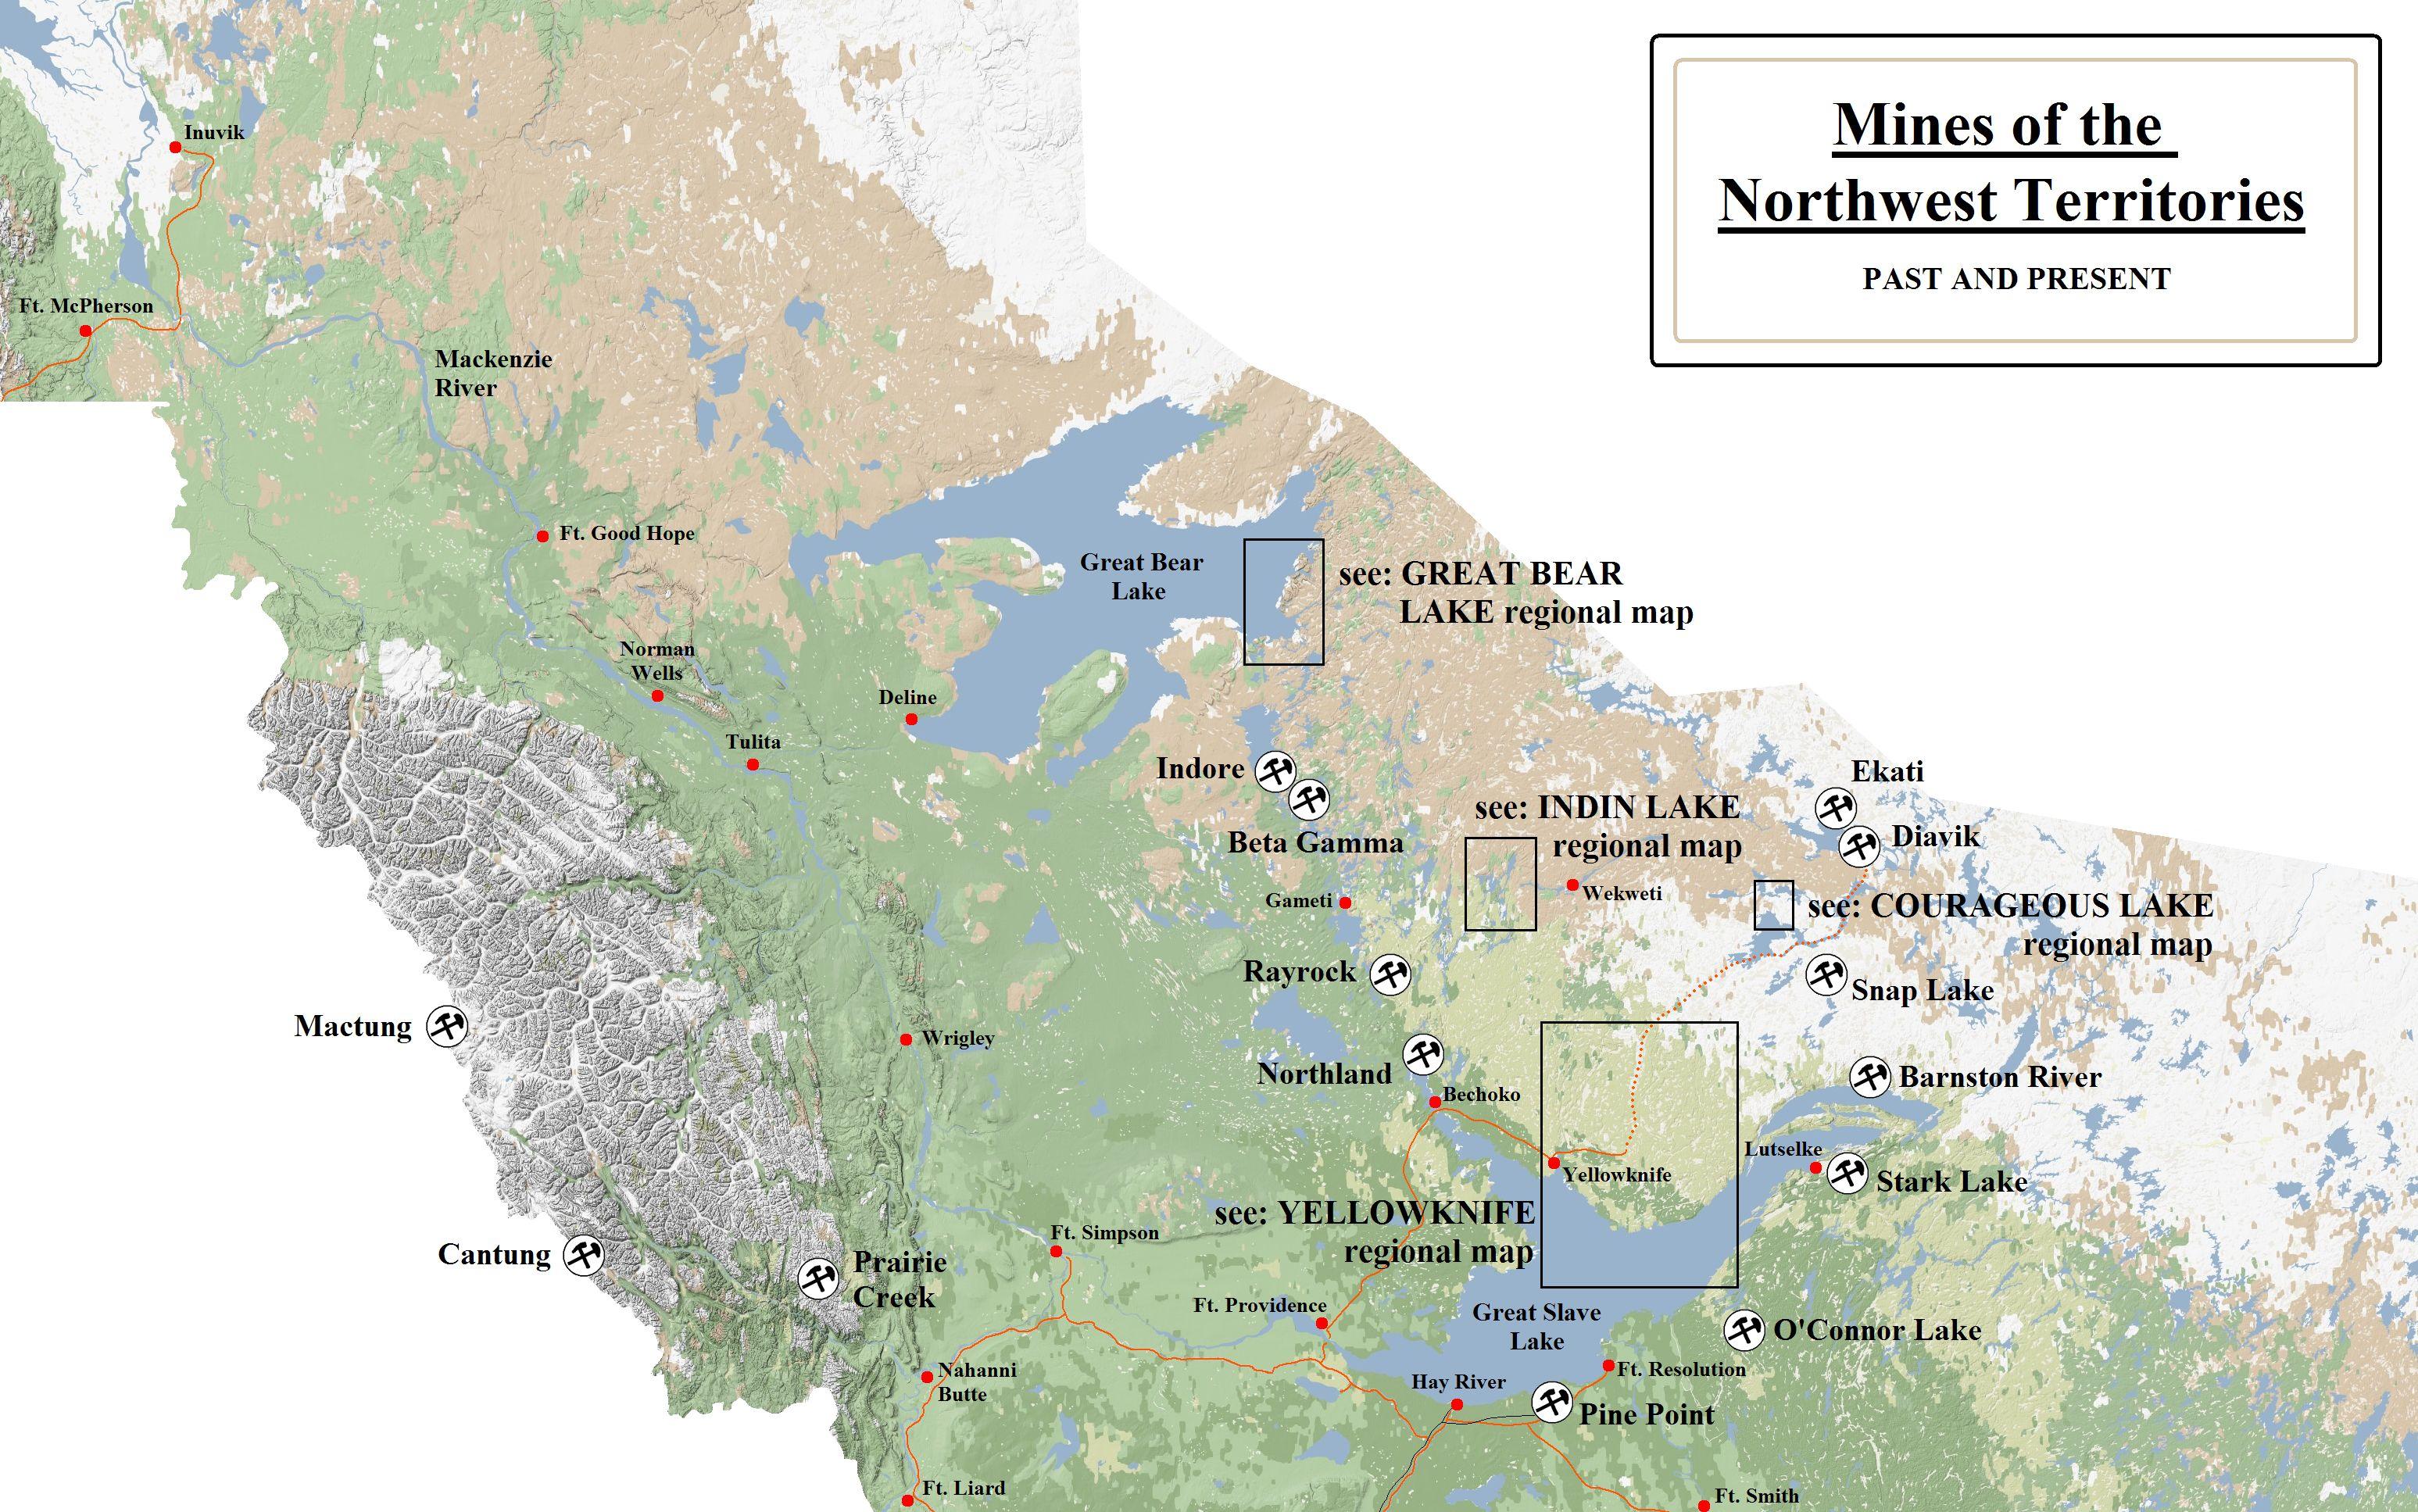 Mines In The Northwest Territories